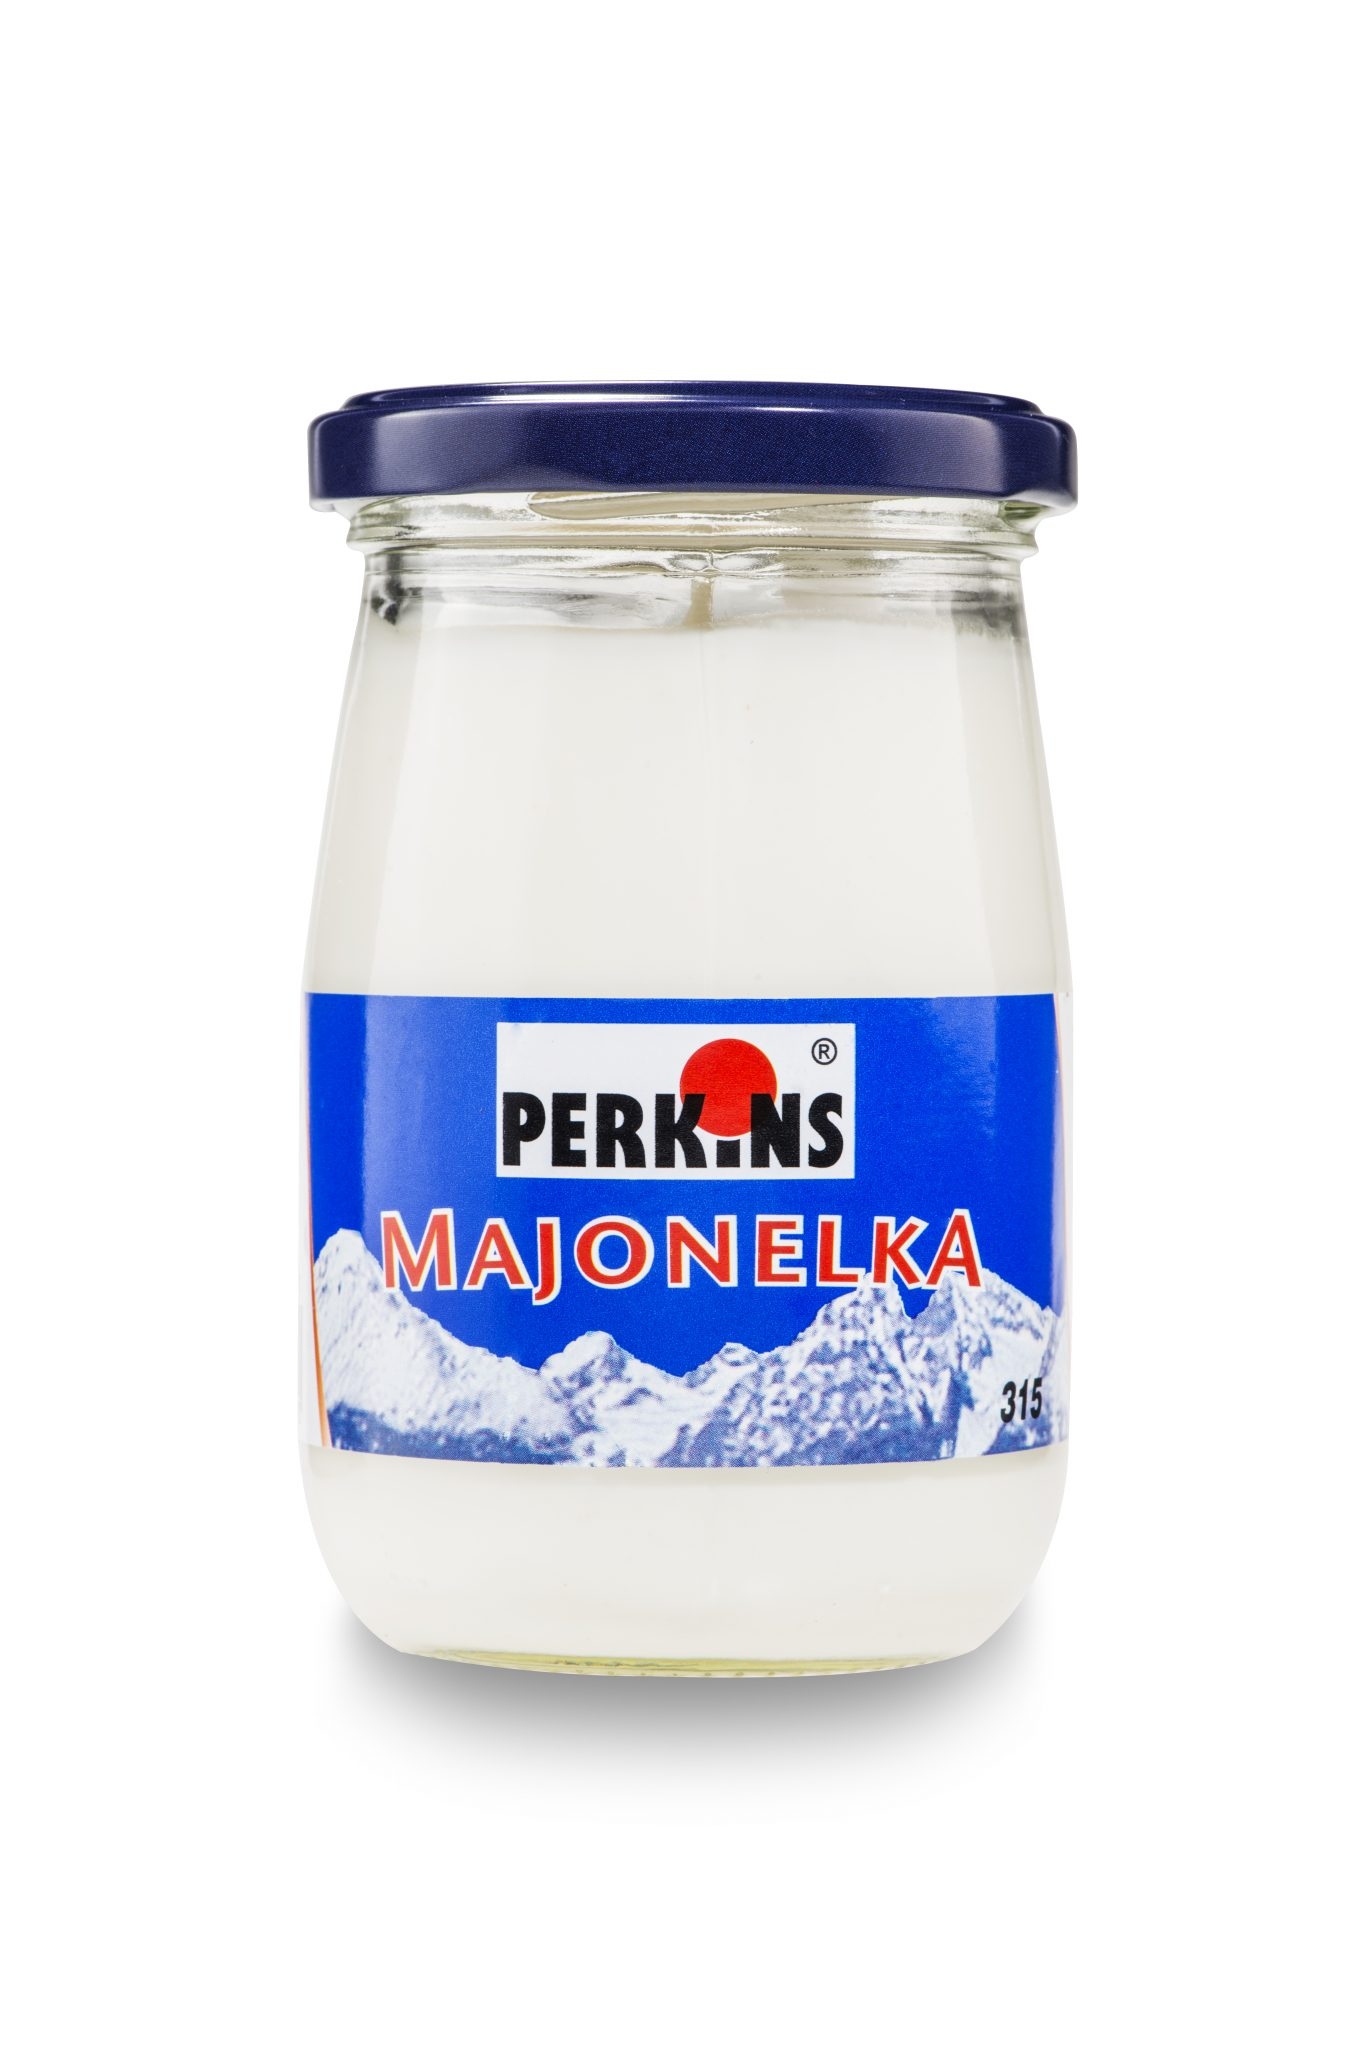 MAJONELKA_315_2 copy